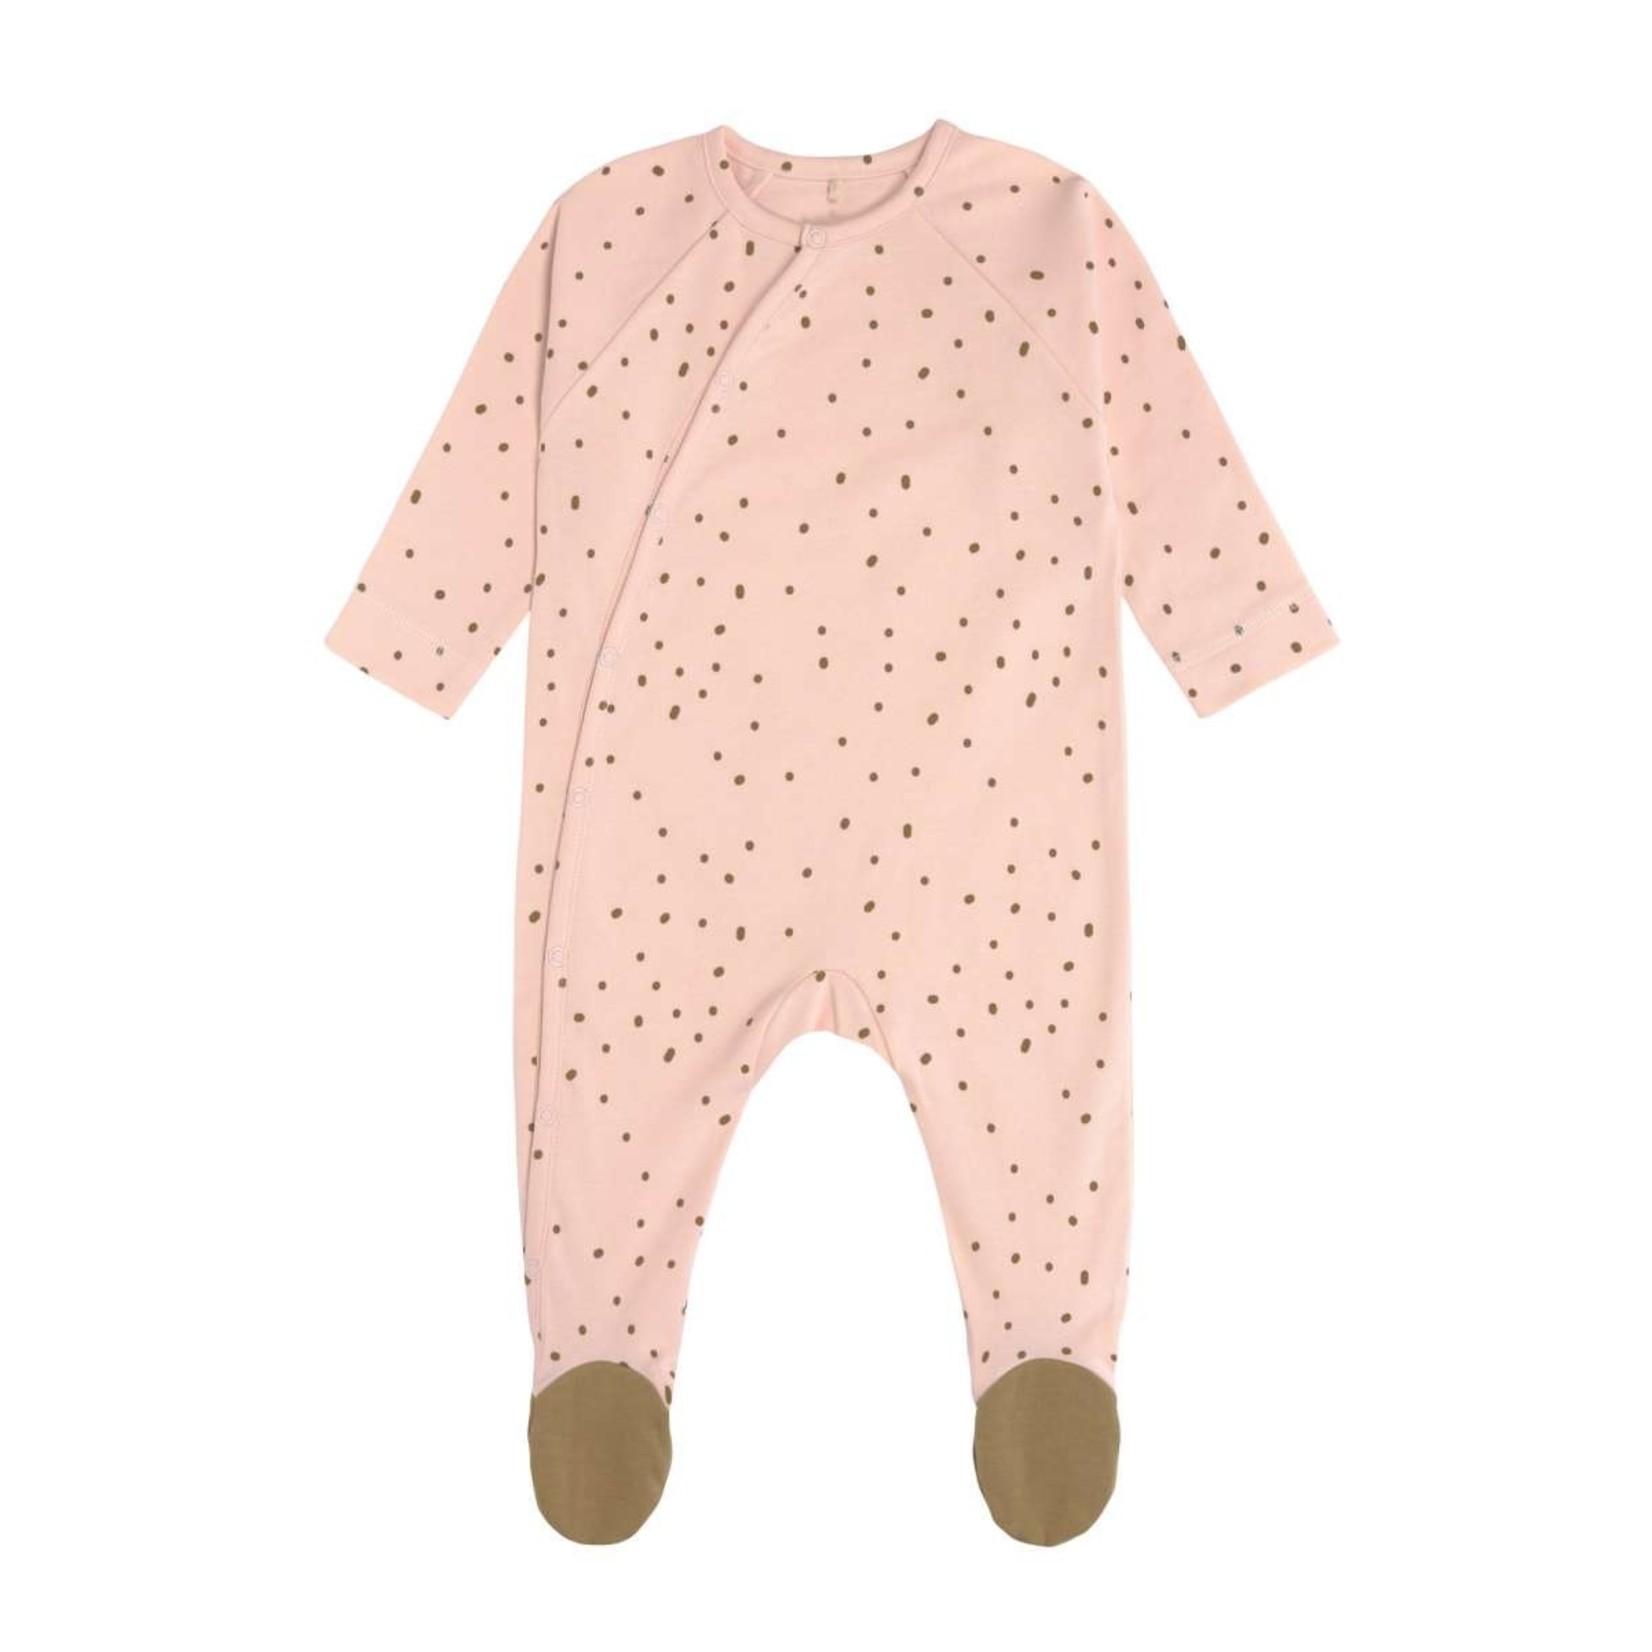 Lässig Lässig Pyjama met voetjes Gots Powder Pink